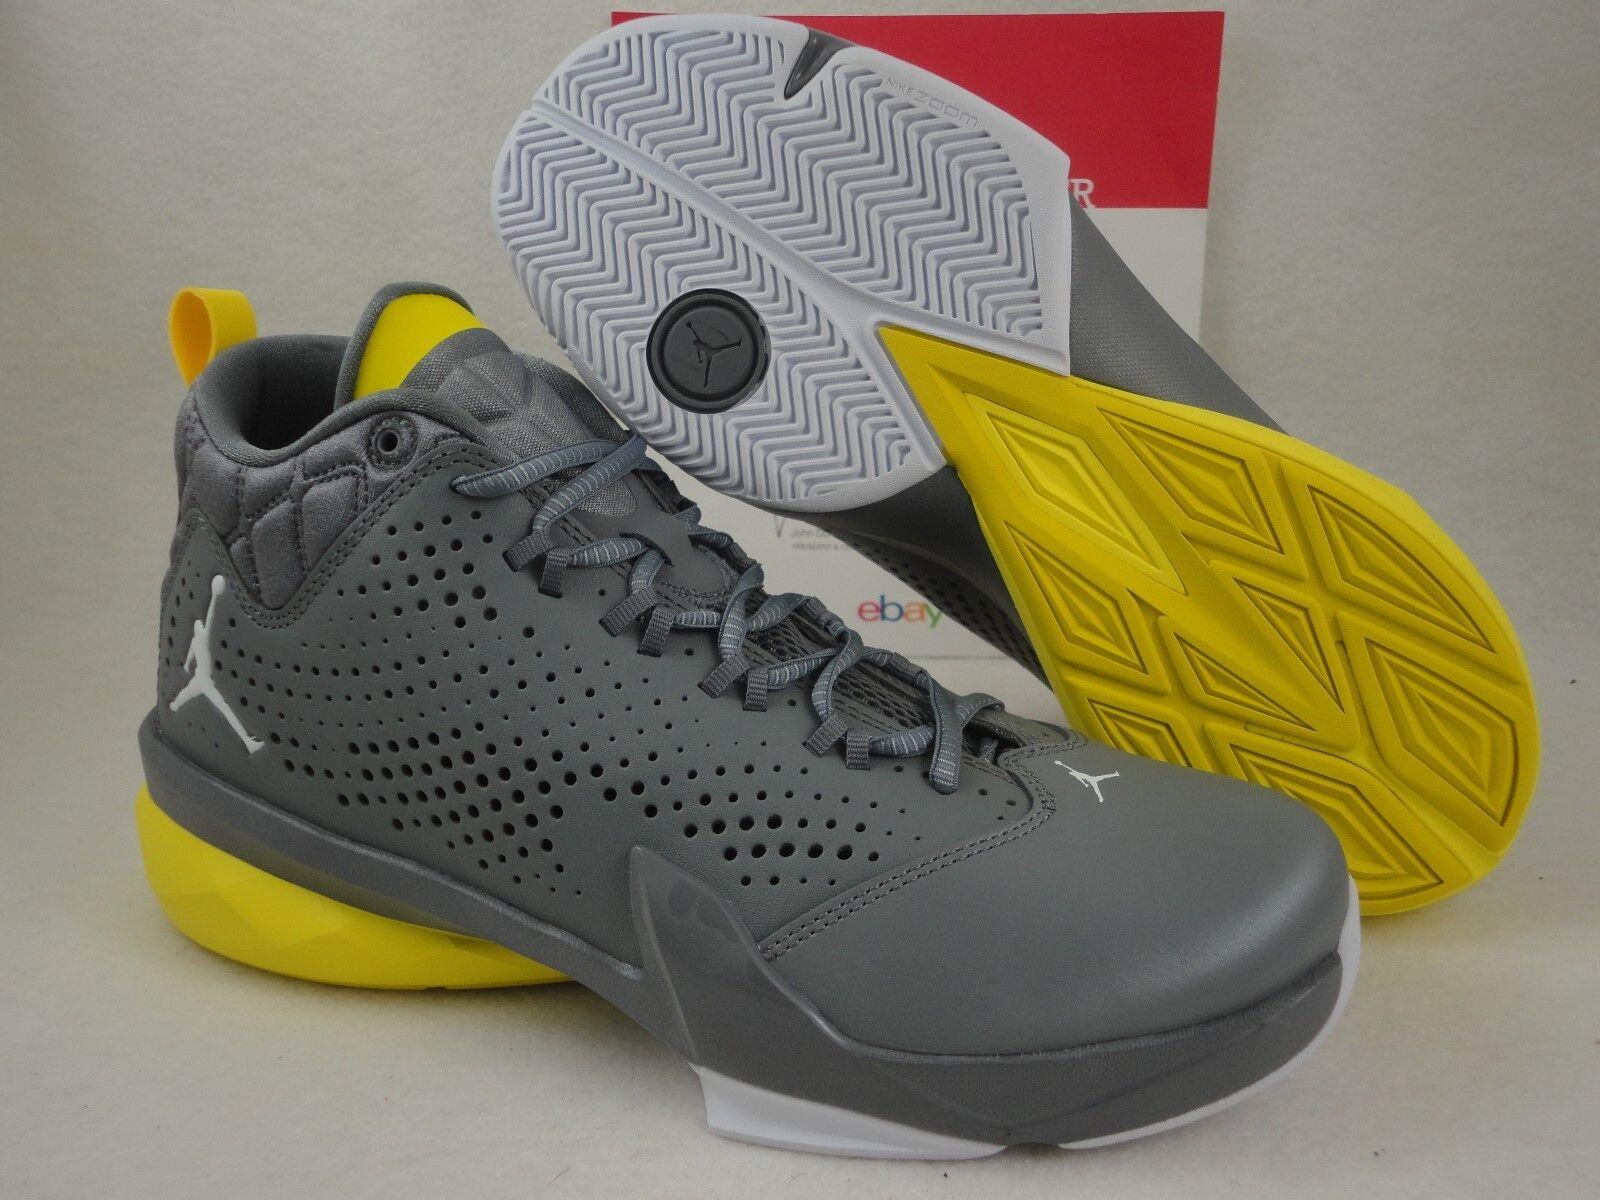 Nike Jordan Flight Time 14,5, gris / amarillo 14 10 diseño retro Lunarlon, SZ 10 14 e309cf